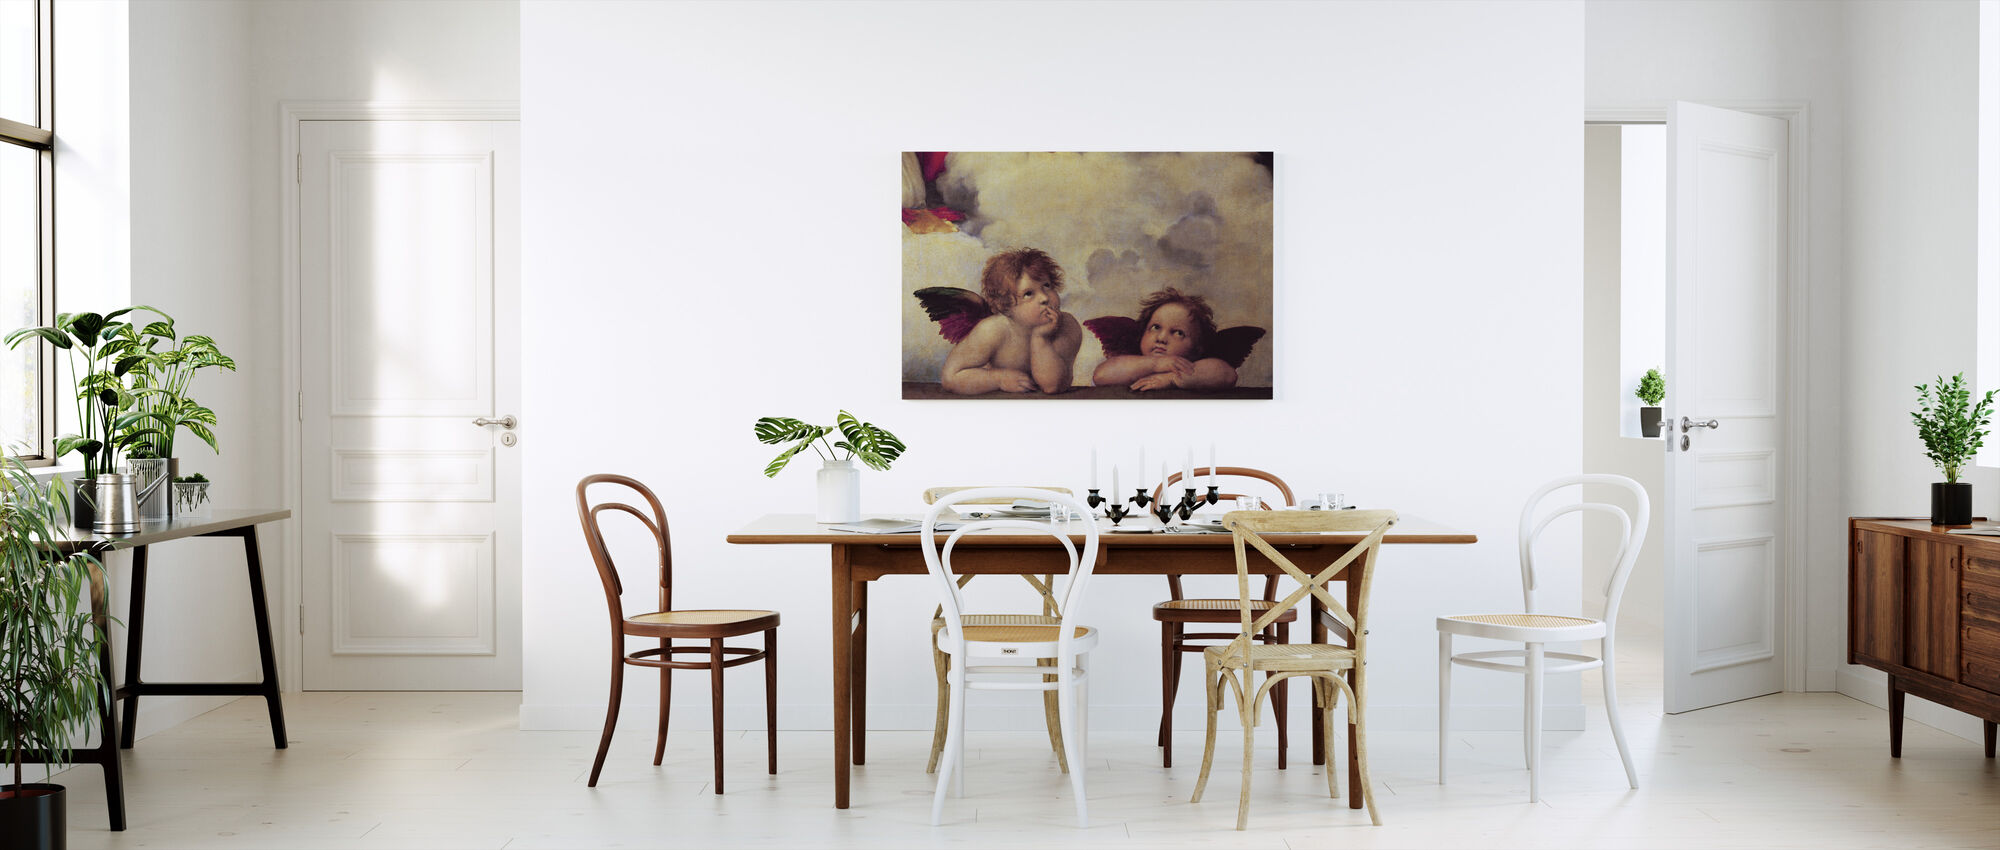 Two Angels, Raffaello Santi - Canvas print - Kitchen